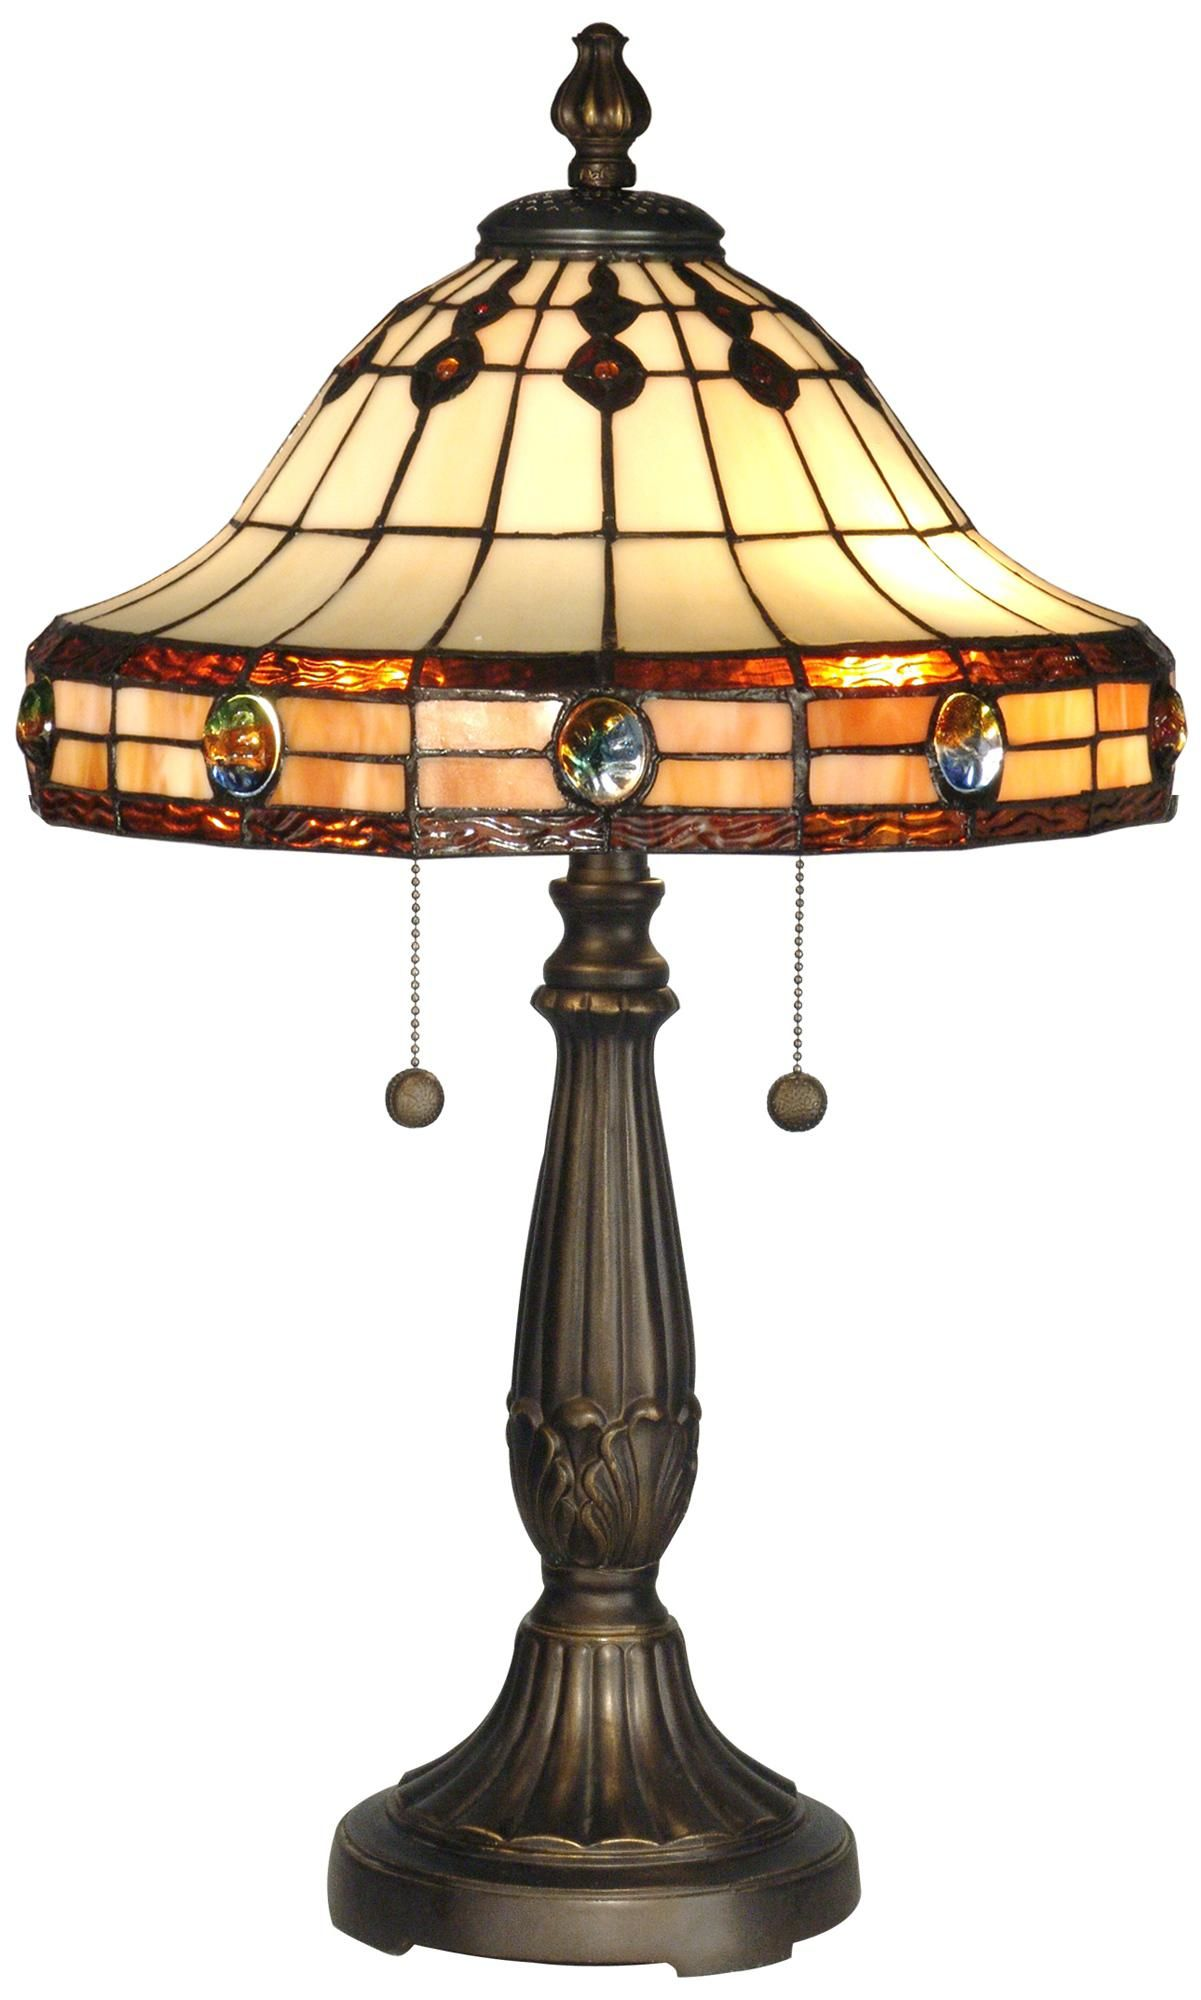 Mission Prairie Table Lamp By Robert Louis Tiffany 20383 Lamps Plus In 2020 Tiffany Style Table Lamps Table Lamp Craftsman Lamps